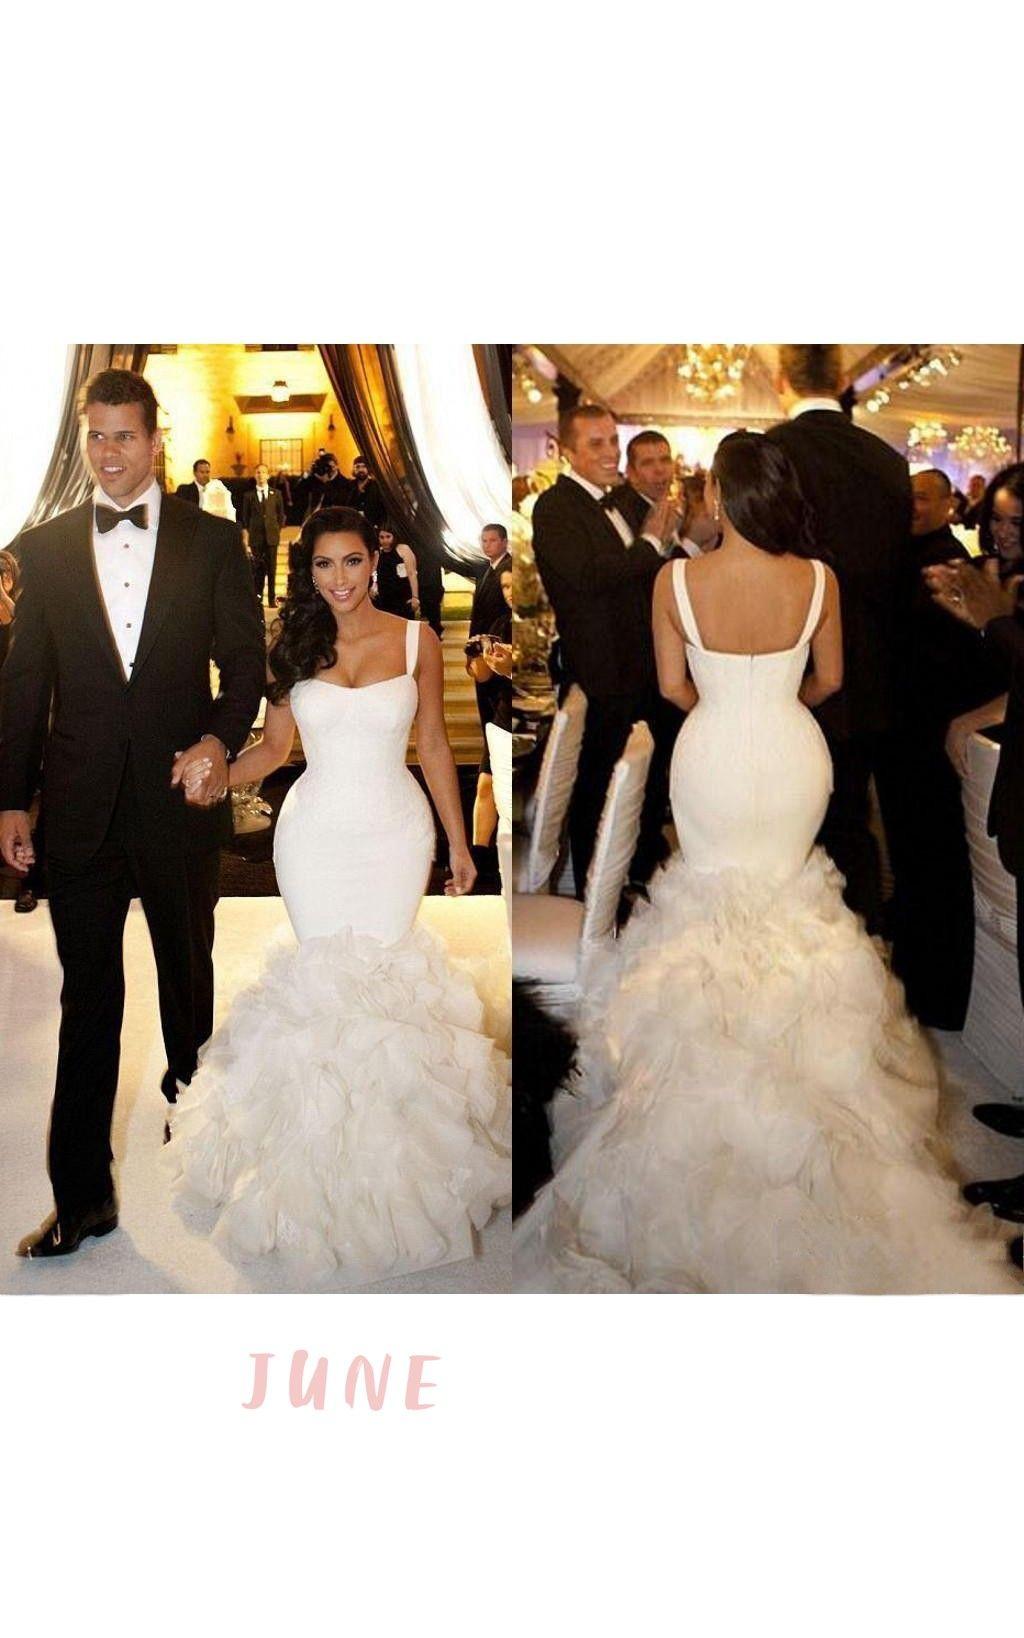 Elegant Spaghetti Straps Mermaid Ruffled Organza Gown Celebrity Wedding Dresses Kim Kardashian Wedding Dress Wedding Dresses [ 1638 x 1024 Pixel ]